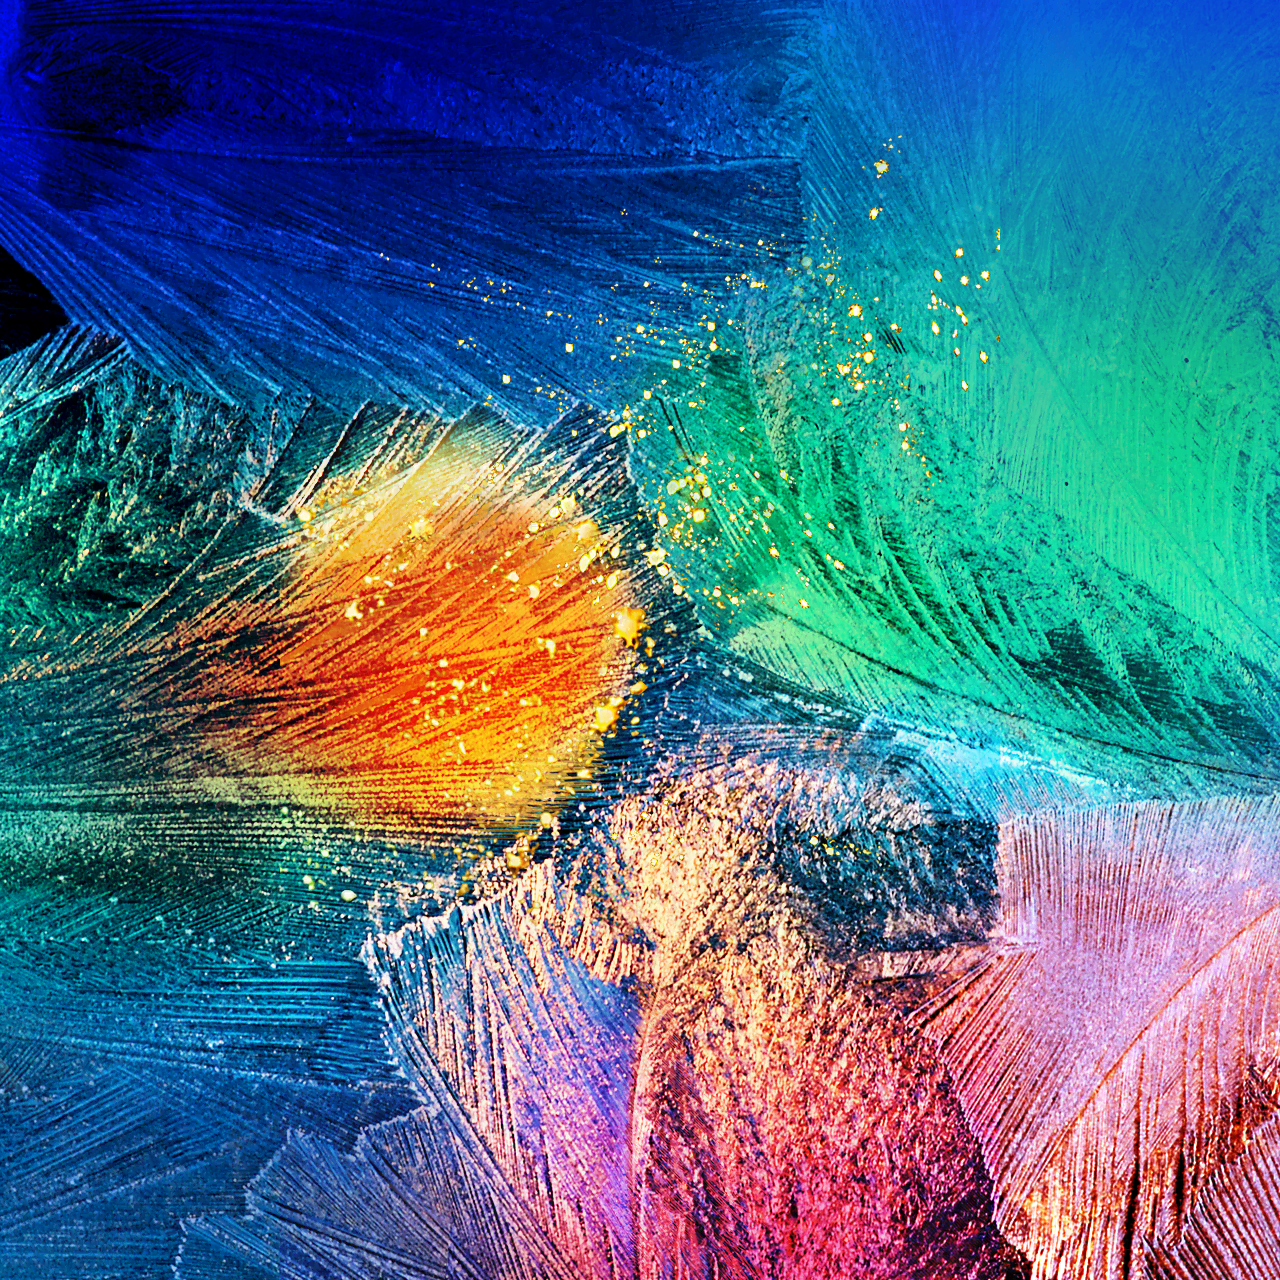 Download Samsung Galaxy Alpha Wallpaper